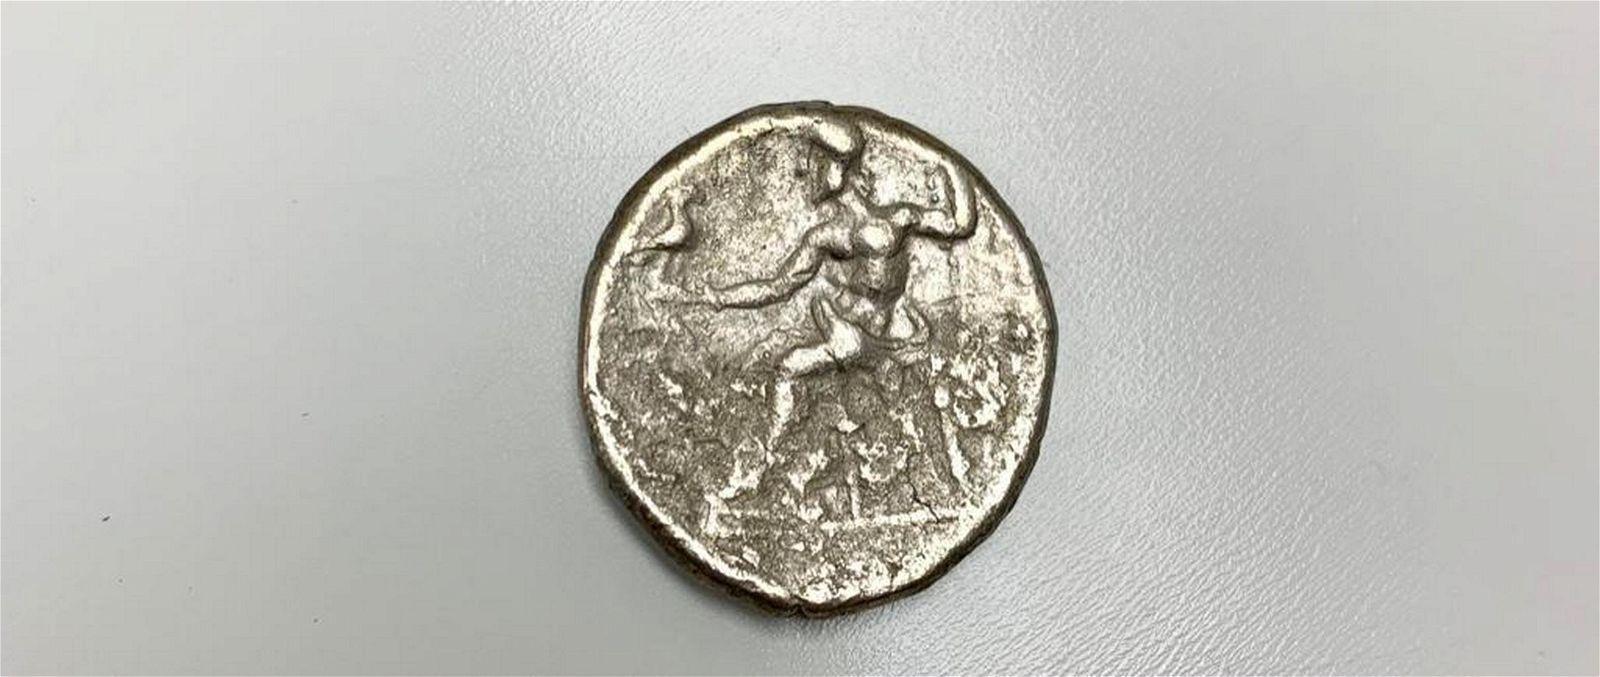 "356-332 B.C Alexander III ""The Great"" Silver"